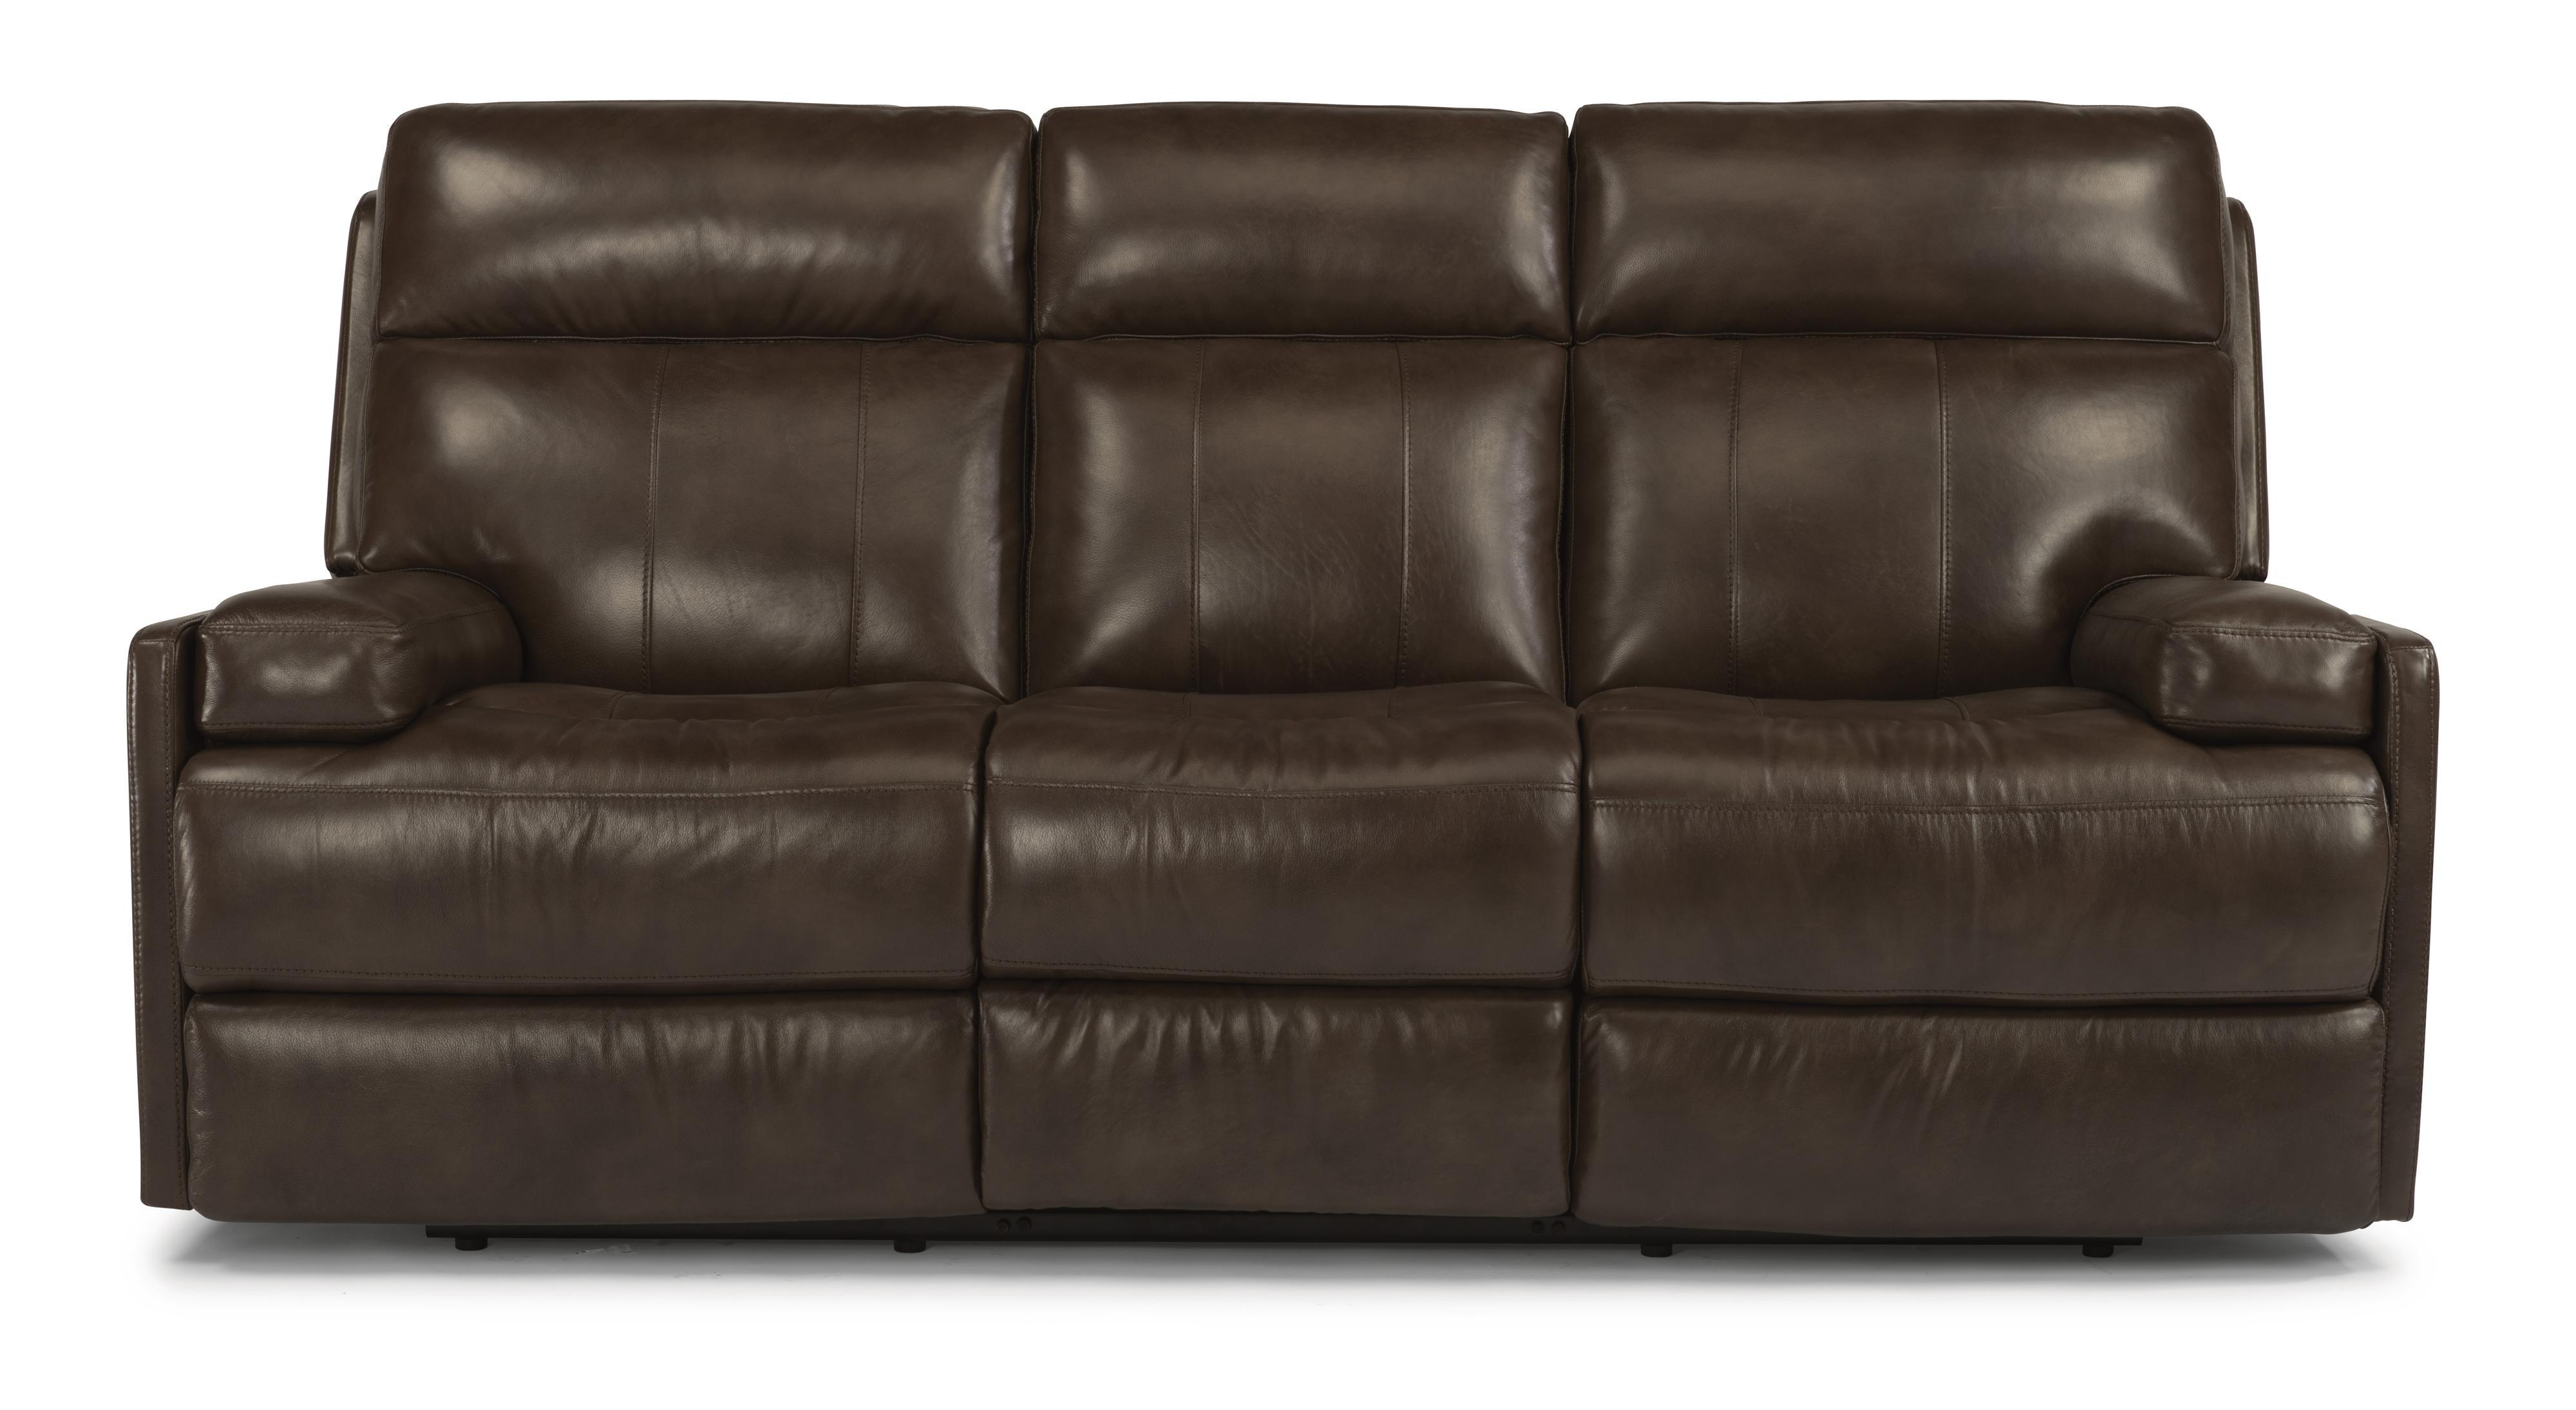 Flexsteel Latitudes-Nathan Power Reclining Sofa - Item Number: 1437-62P-660-74